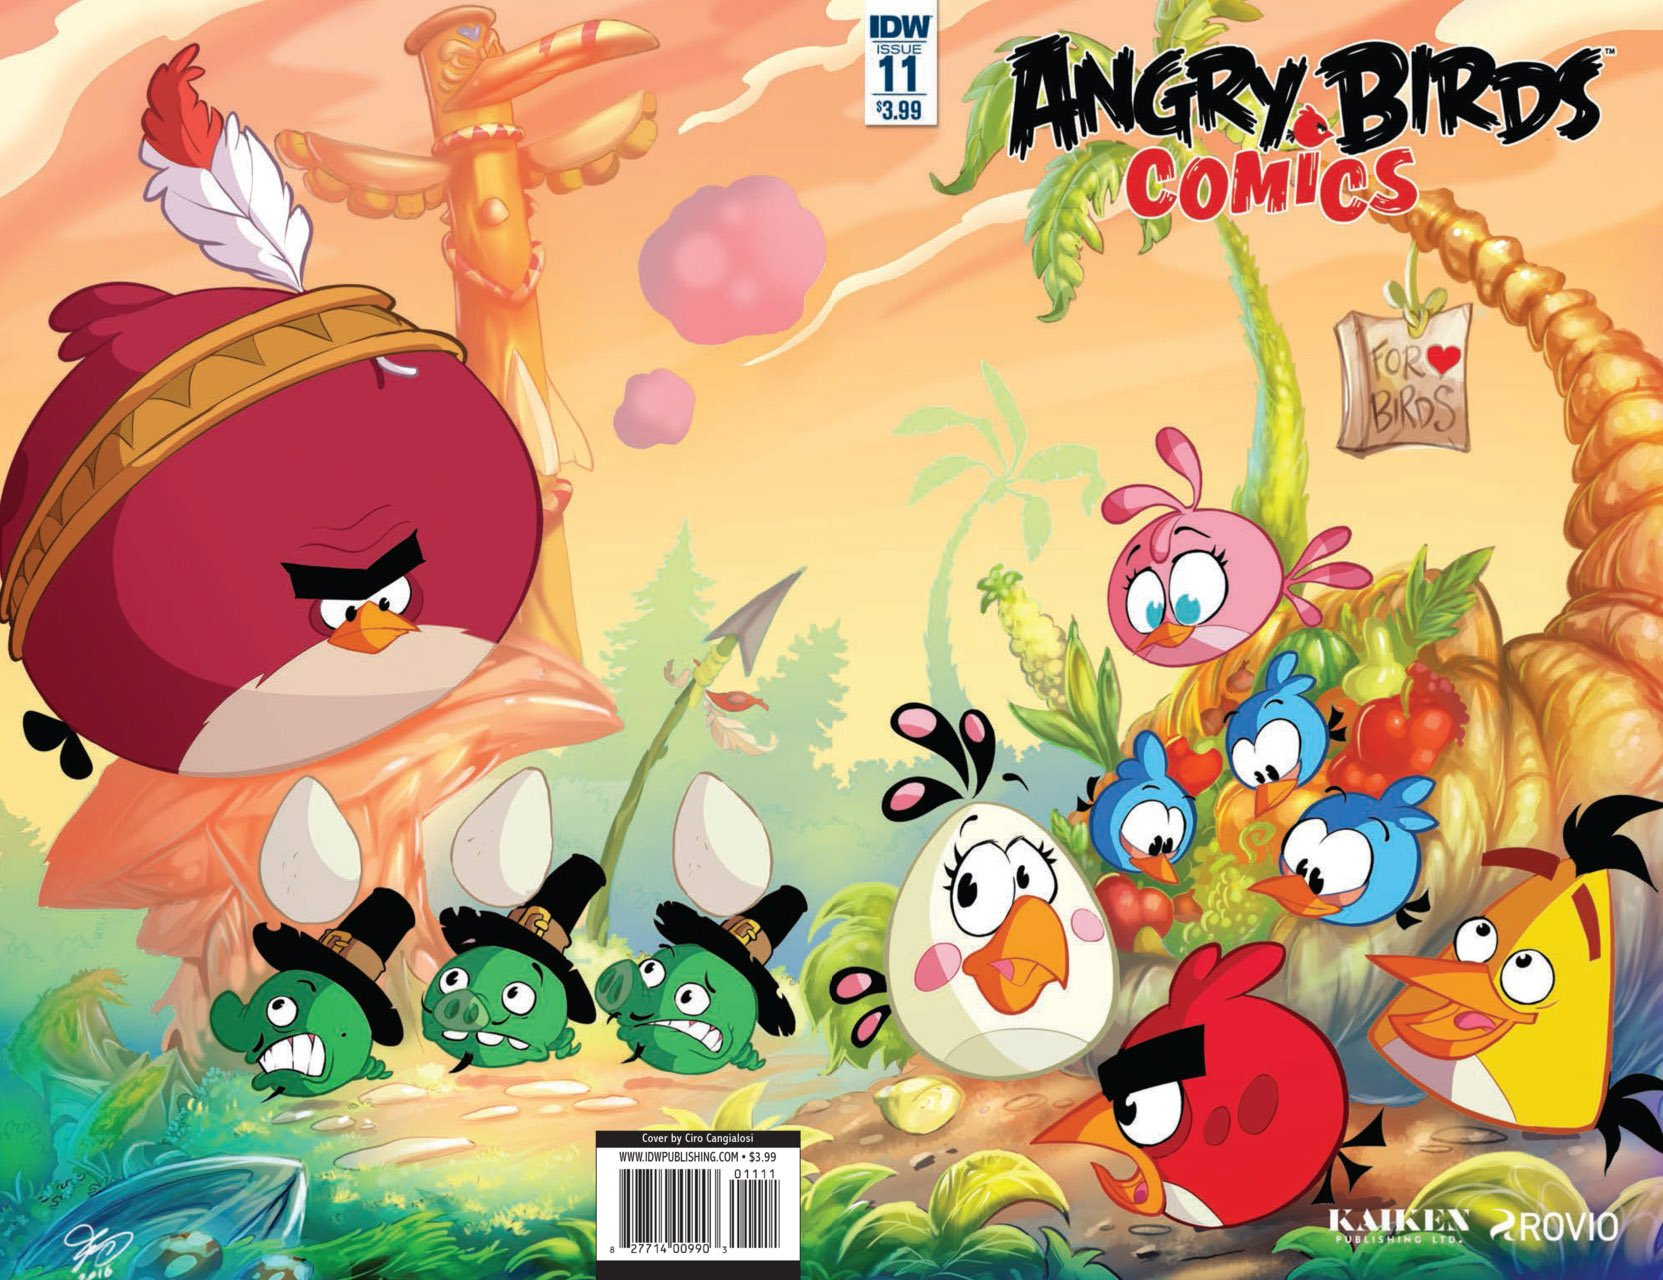 Angry Birds Comics Vol.2 011 (November 2016)